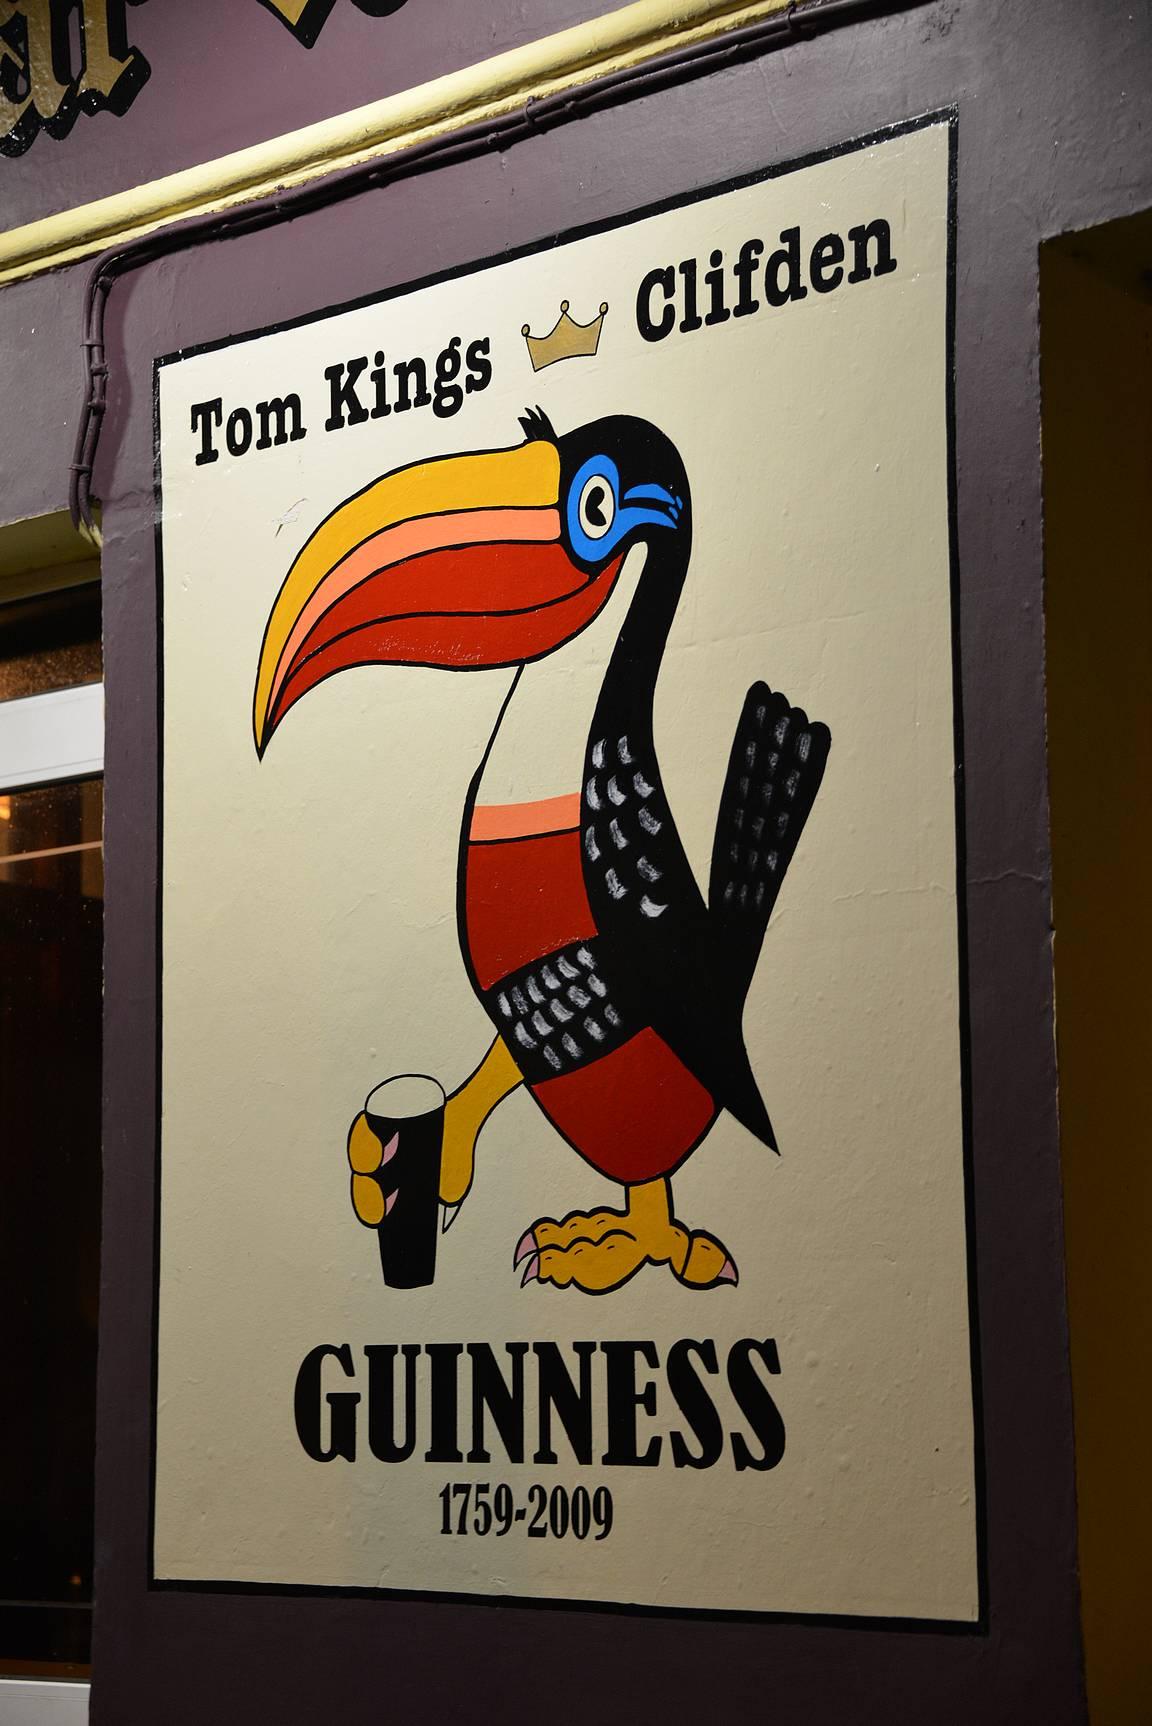 Paikallisten mukaan Clifdenin paras Guinness tarjoillaan Tom King's Barissa.